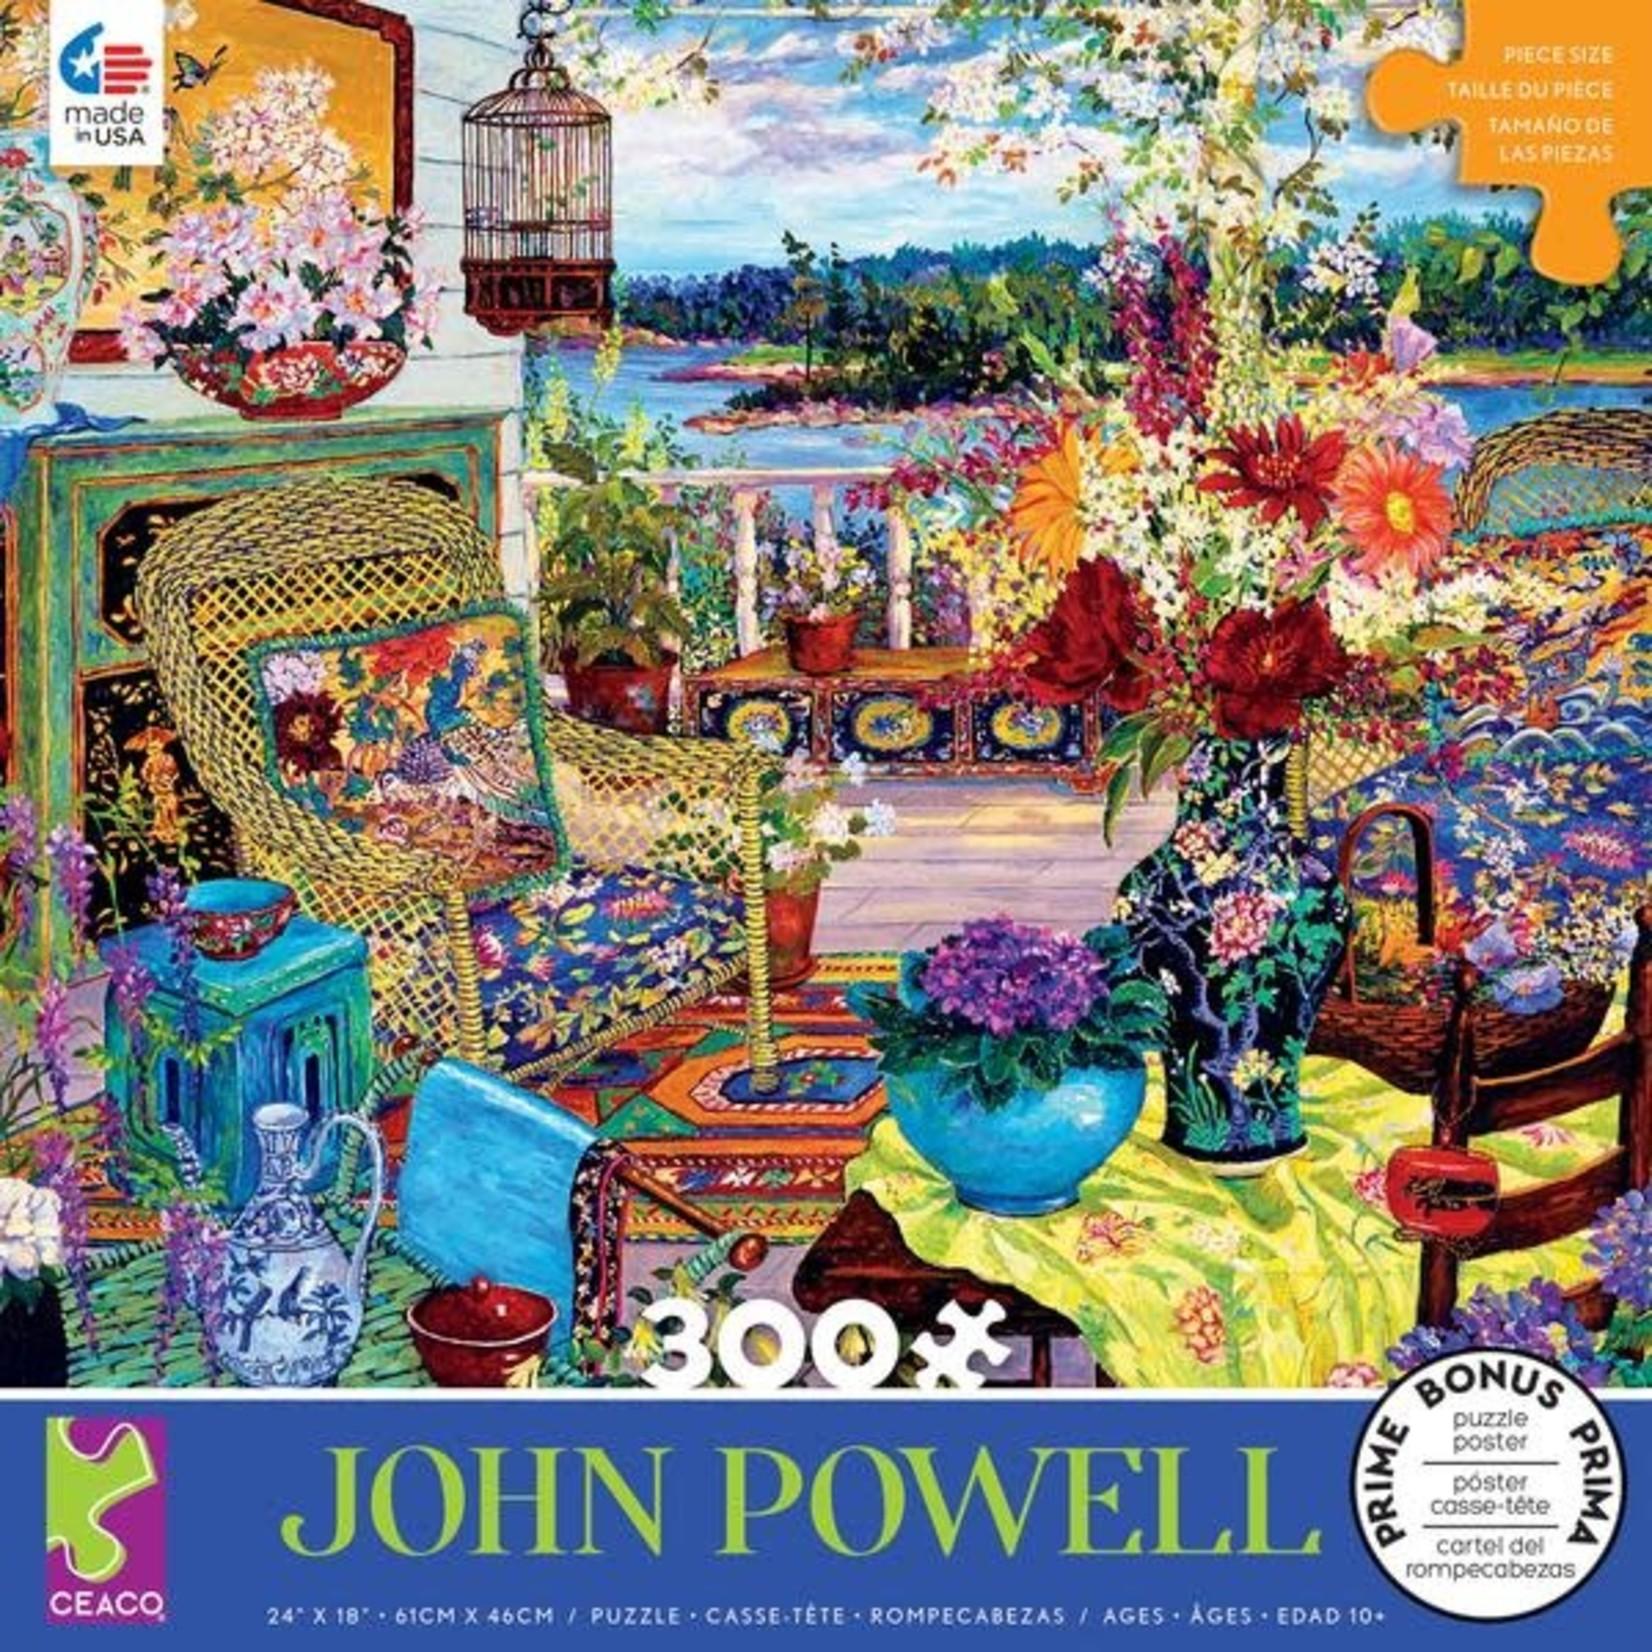 ceaco Ceaco - 300 Piece Puzzle: John Powell - Summer Light